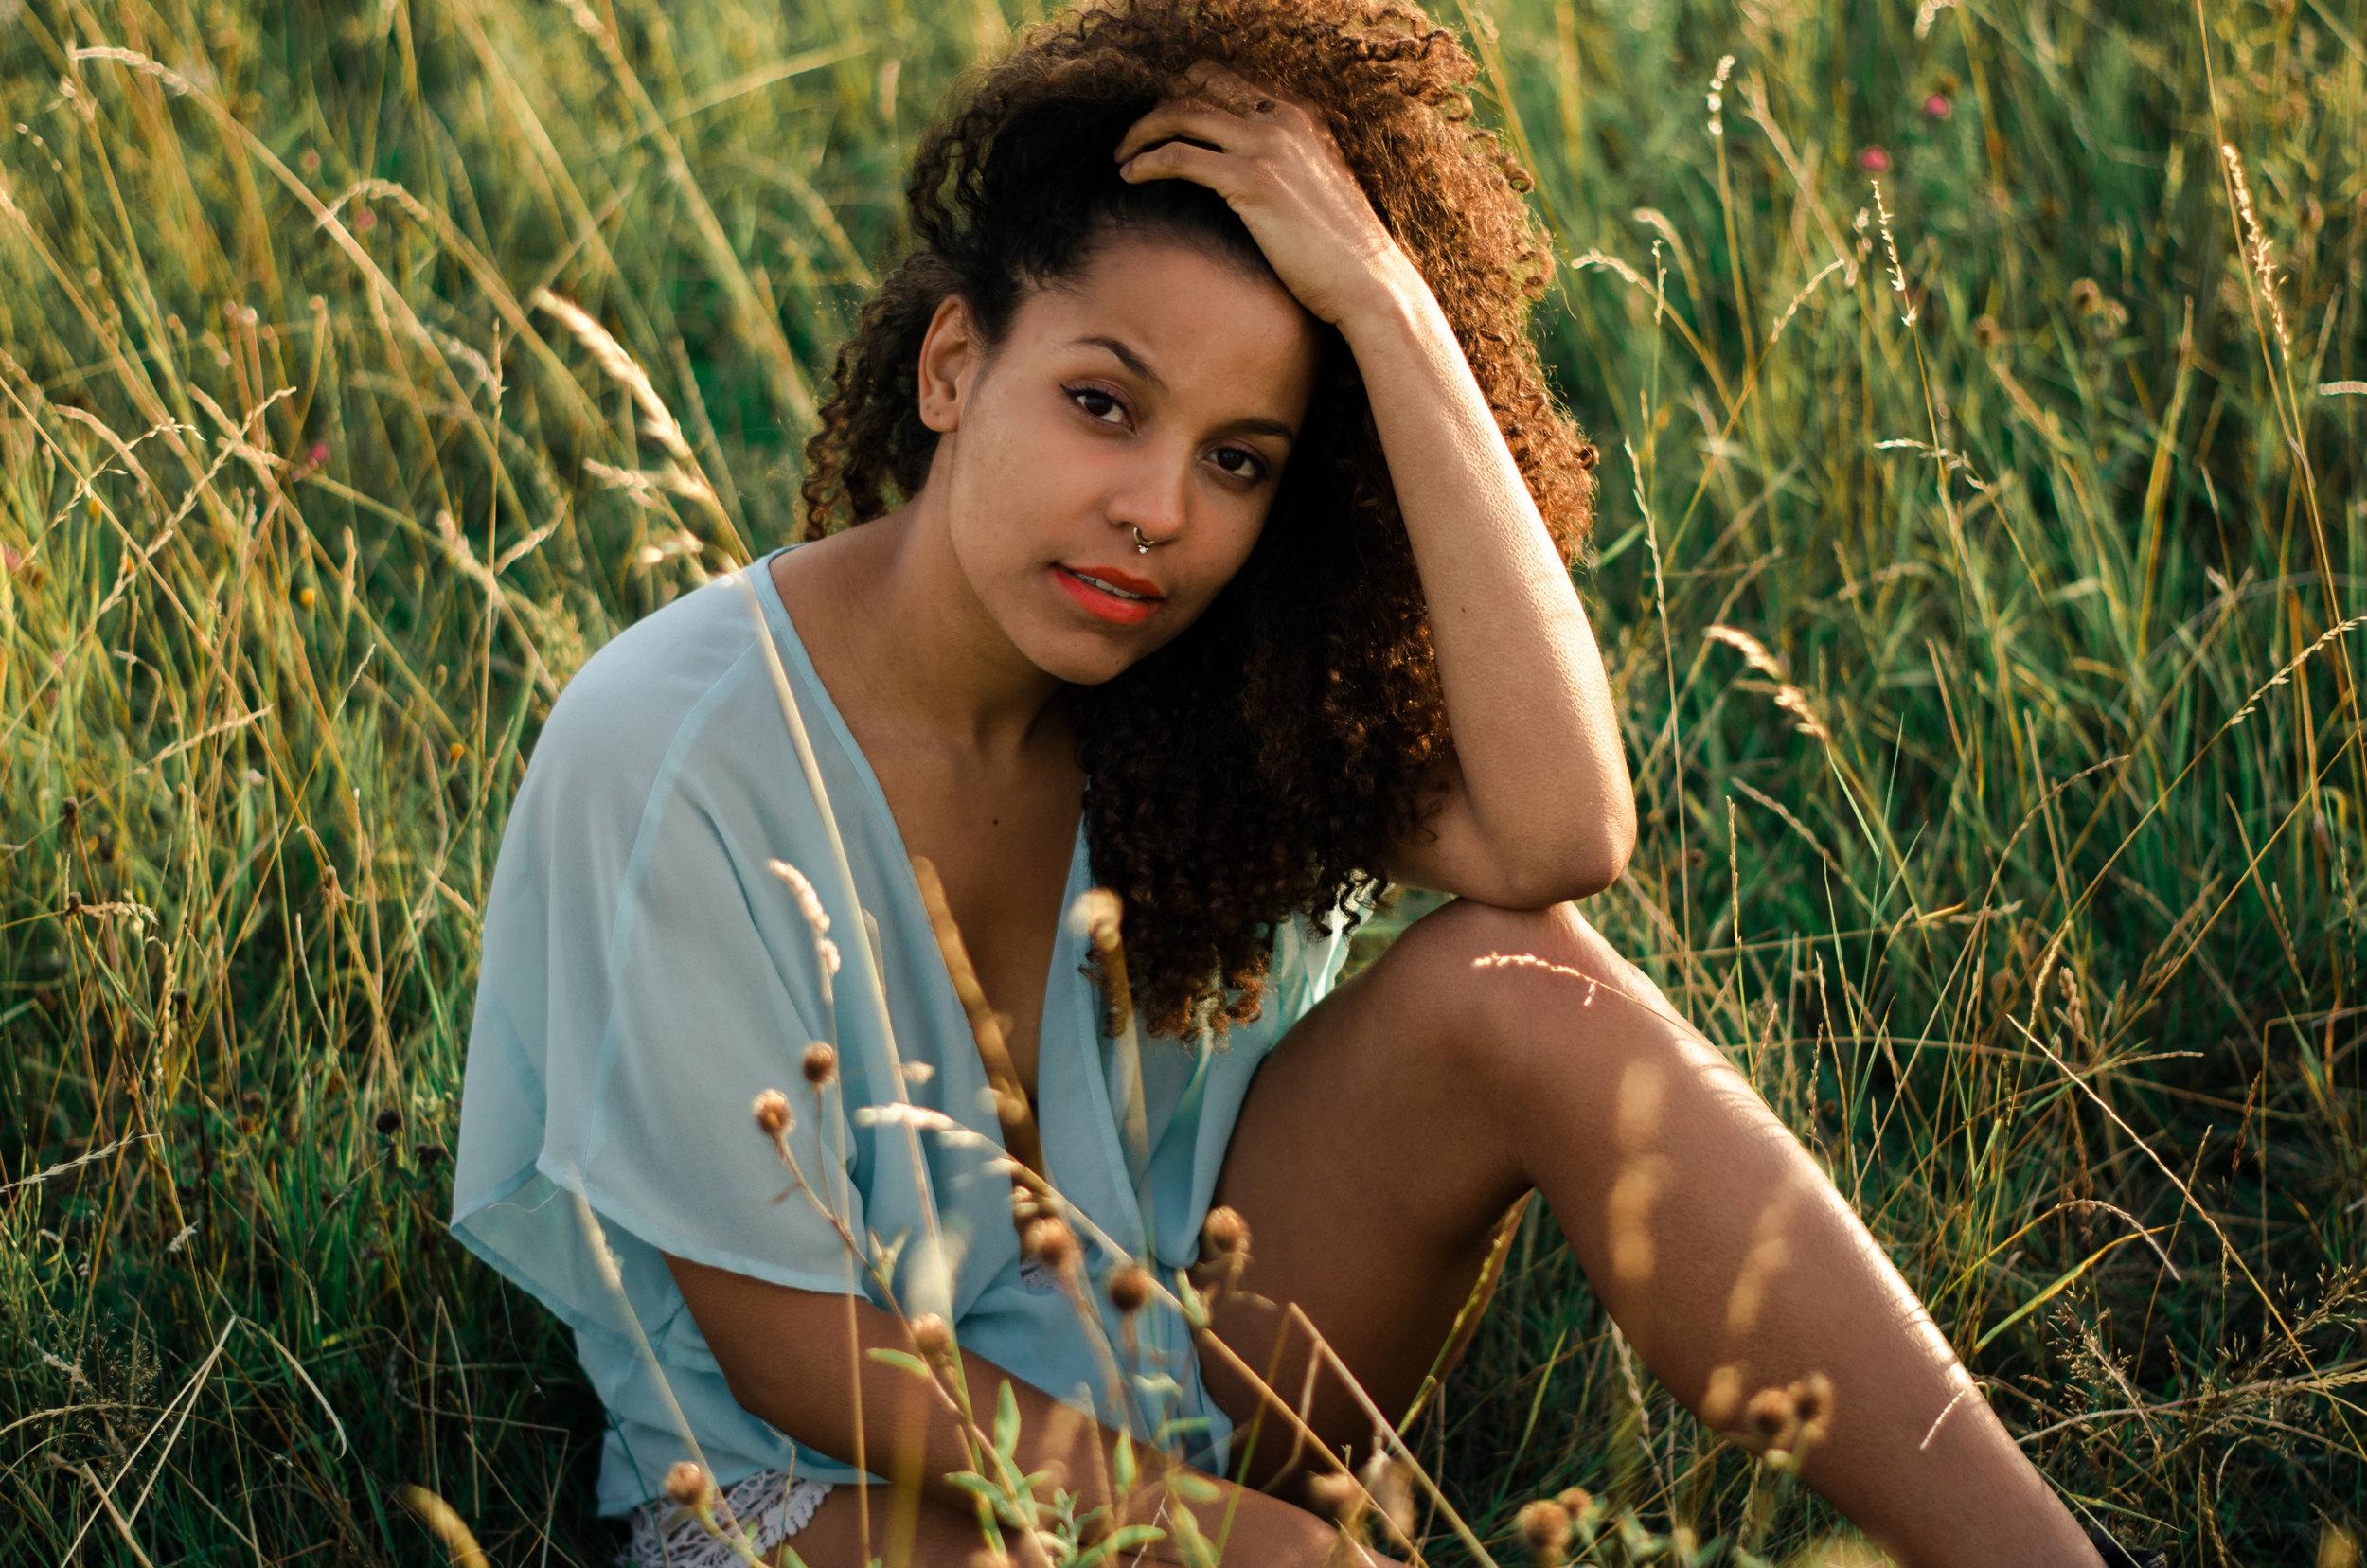 Inka-Portrait-Session-Aiste-Saulyte-Photography-17-07-30-382.jpg